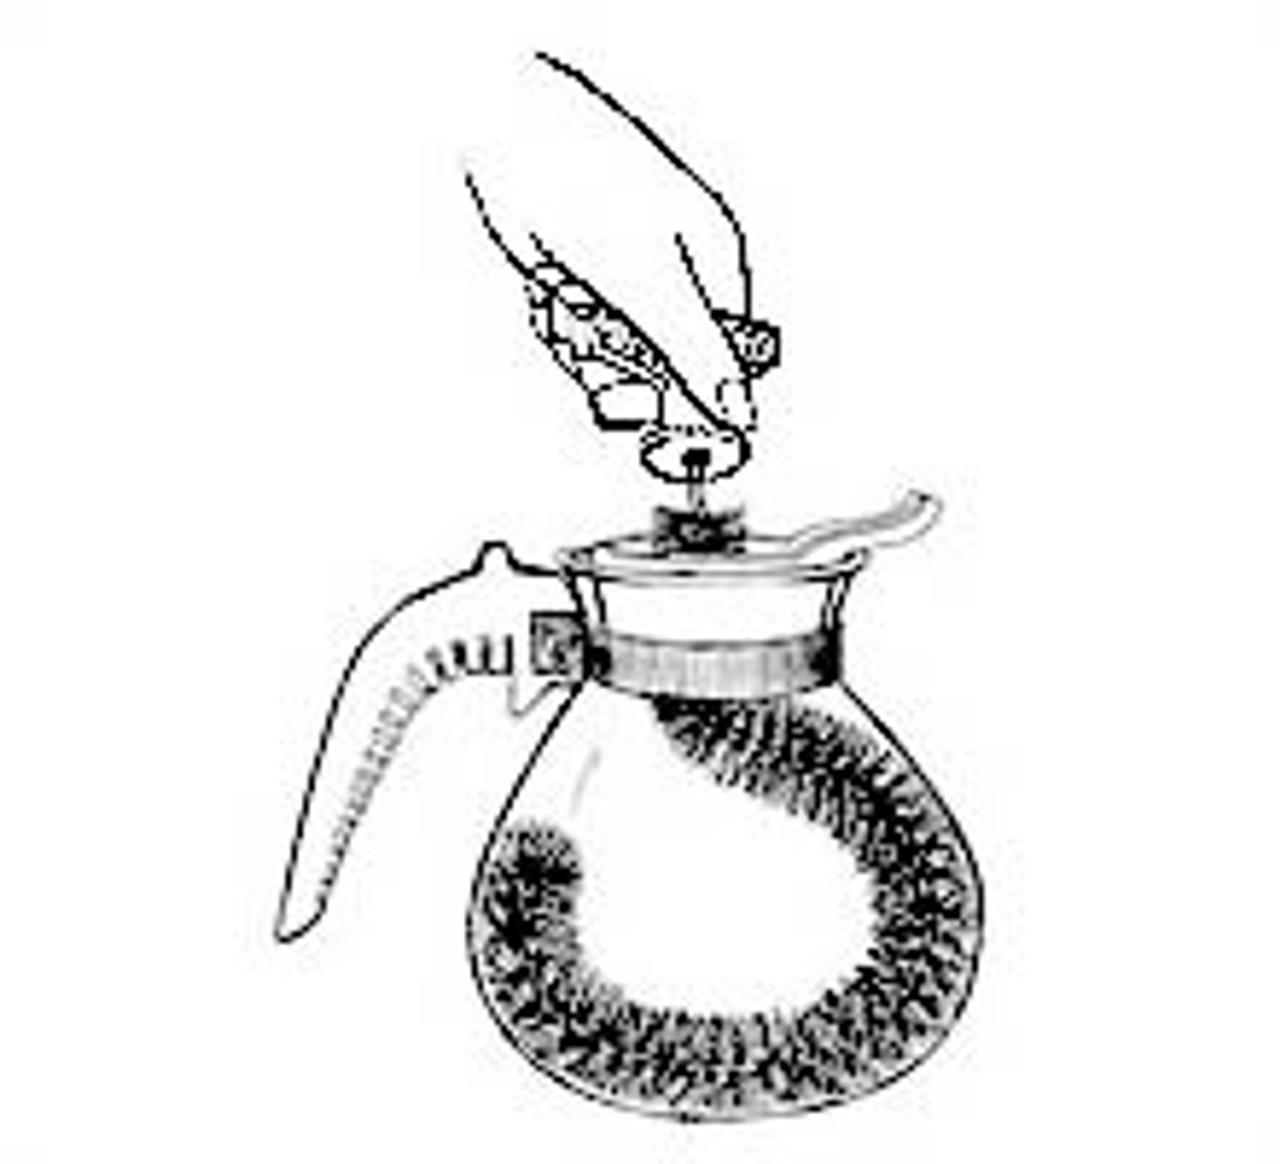 Deluxe Coffee Pot Brush - Drain-Net Technologies